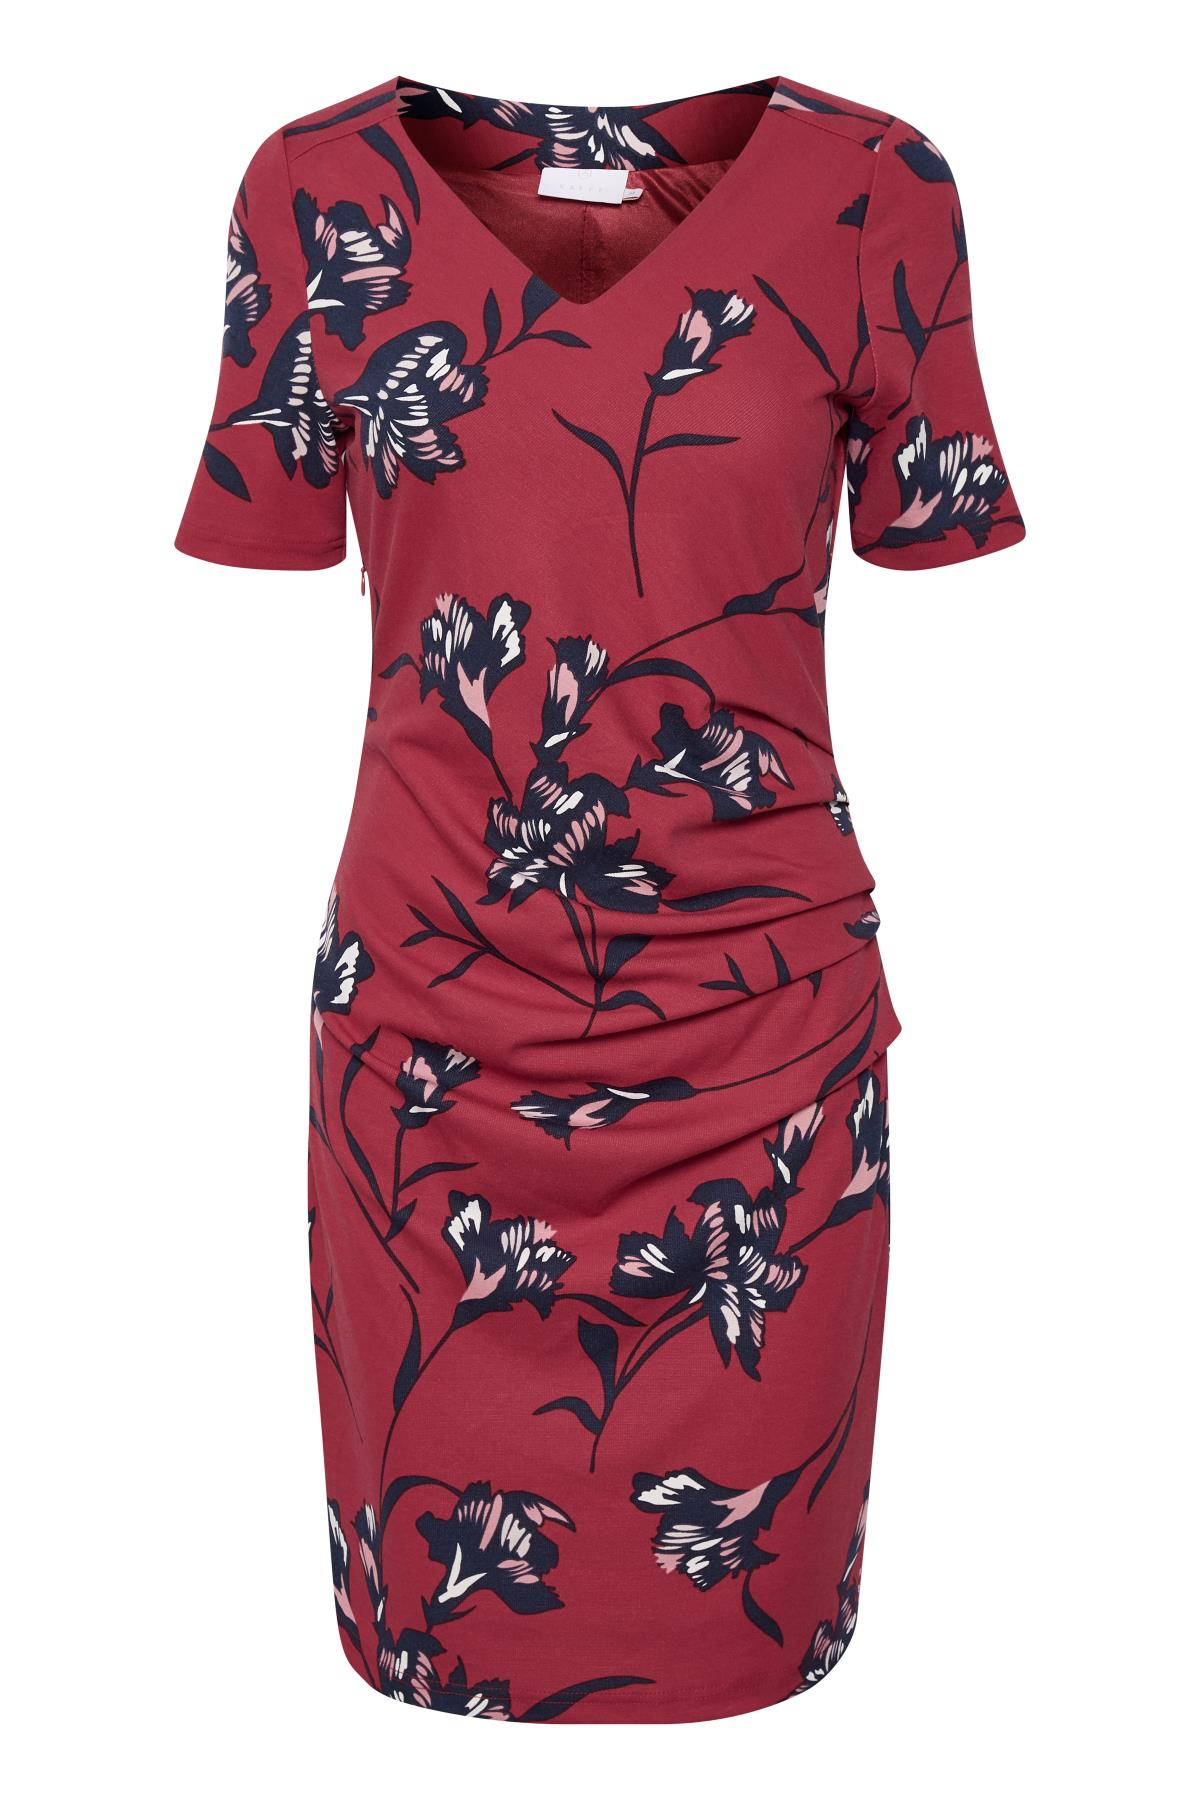 Kaffe Dame Smuk Bea India kjole - Rød/marineblå